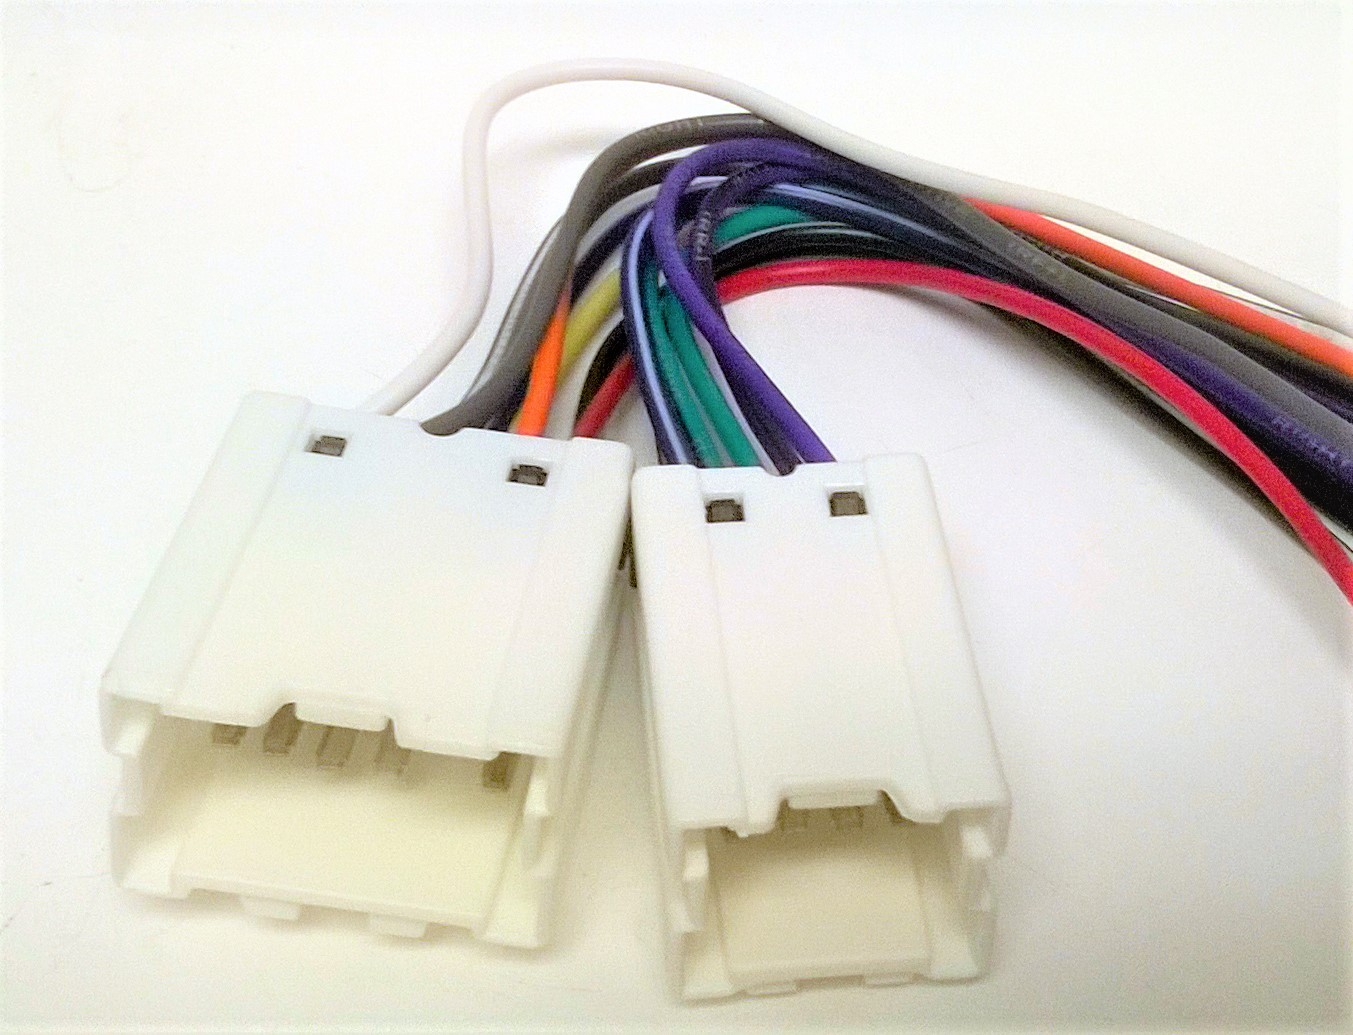 hight resolution of carxtc radio wire harness installs new car stereo fits infiniti i30carxtc radio wire harness installs new